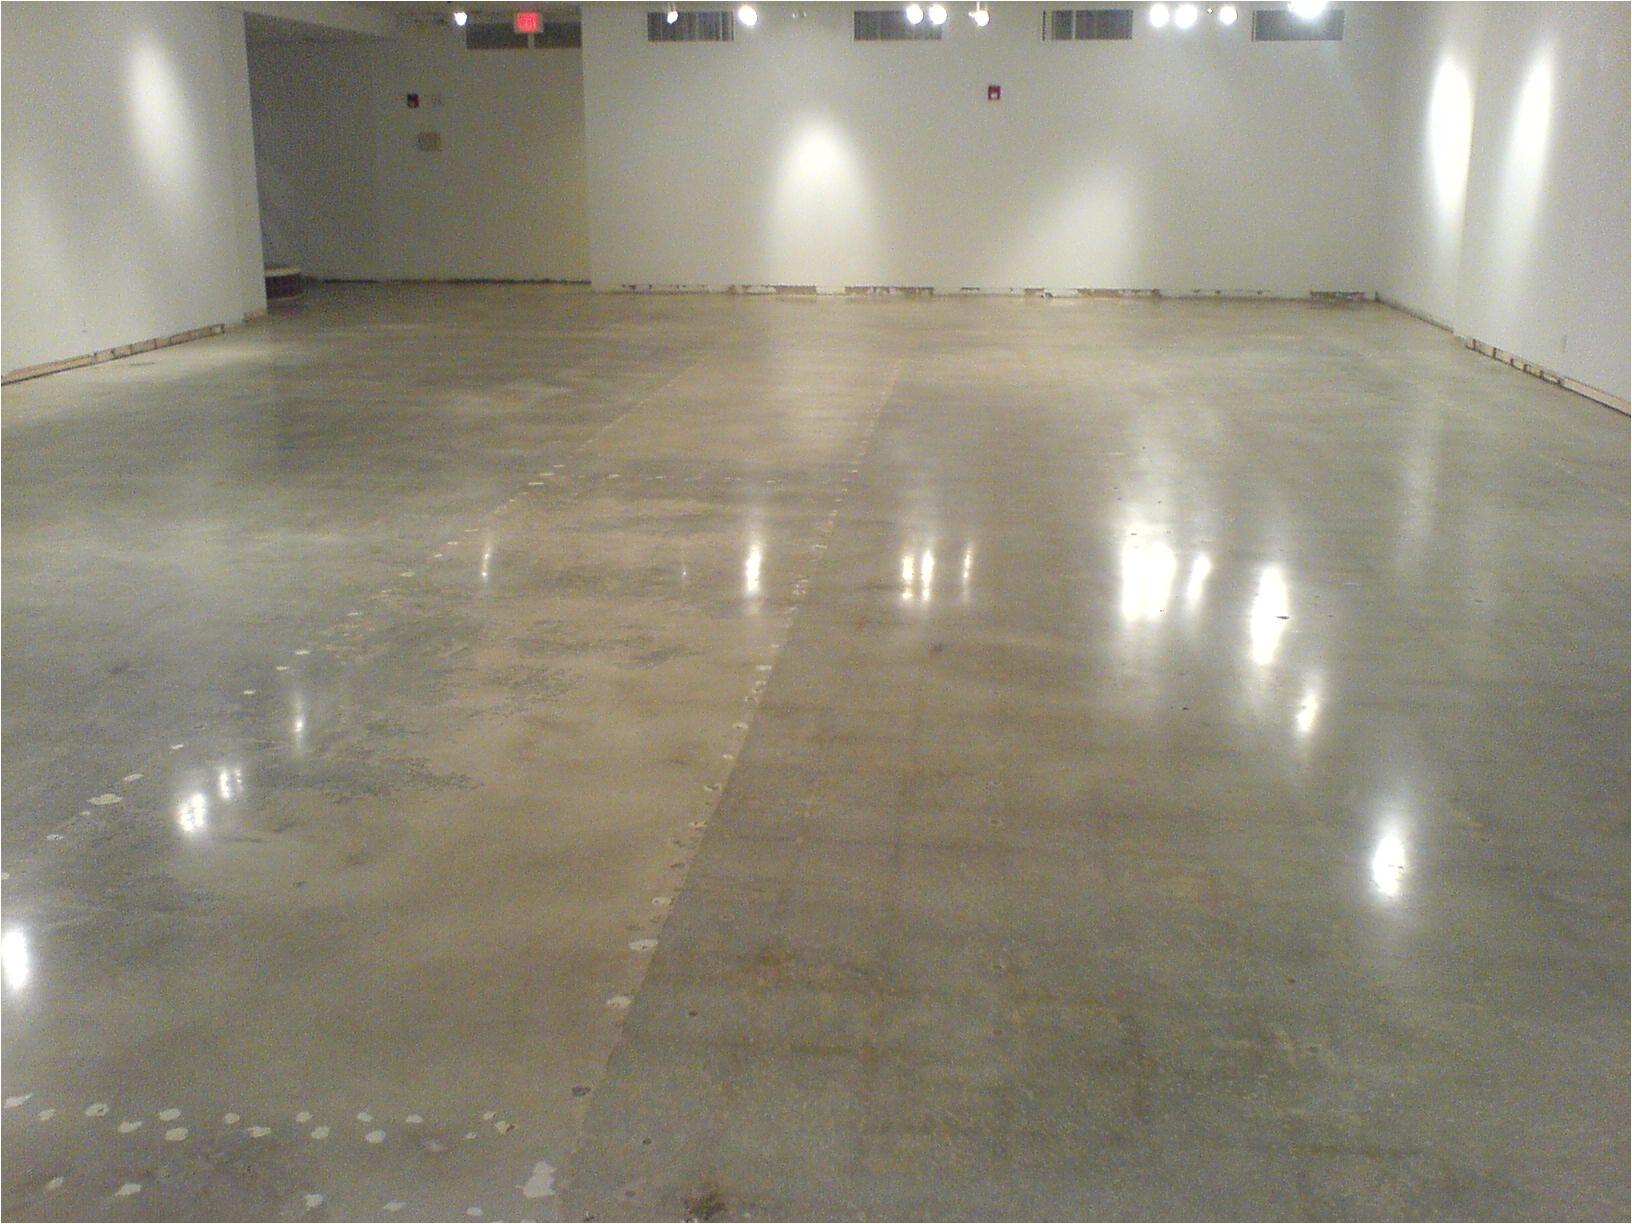 Sherwin Williams Epoxy Basement Floor Paint Benefits Of Polished Concrete Floors Polished Concrete Flooring